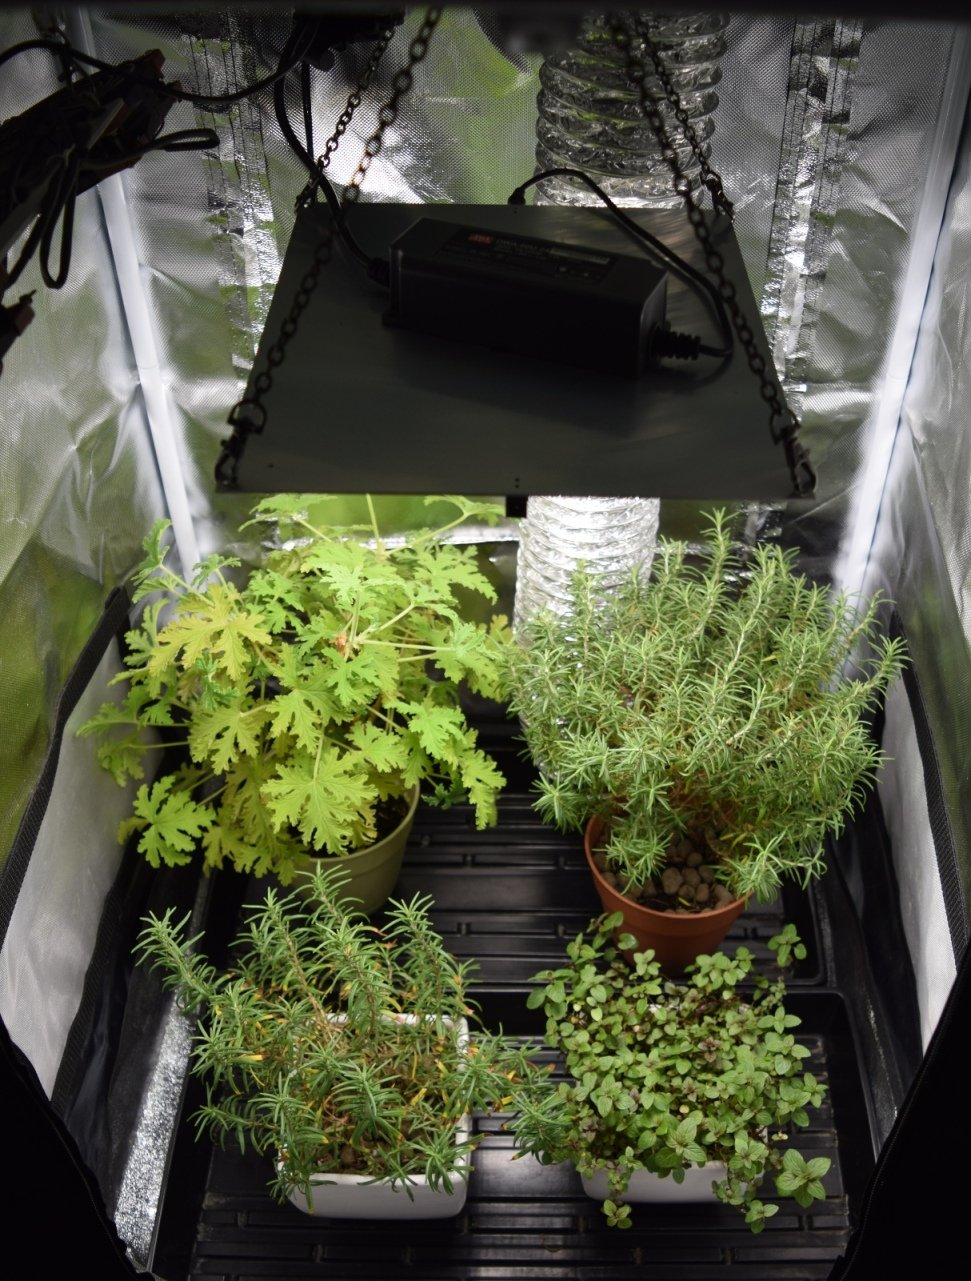 HLG 65 V2 4000K Horticulture Lighting Group Quantum Board LED Grow Light  Veg & Bloom 4000K | Version 2 High-Efficiency Upgraded LM301B LED's